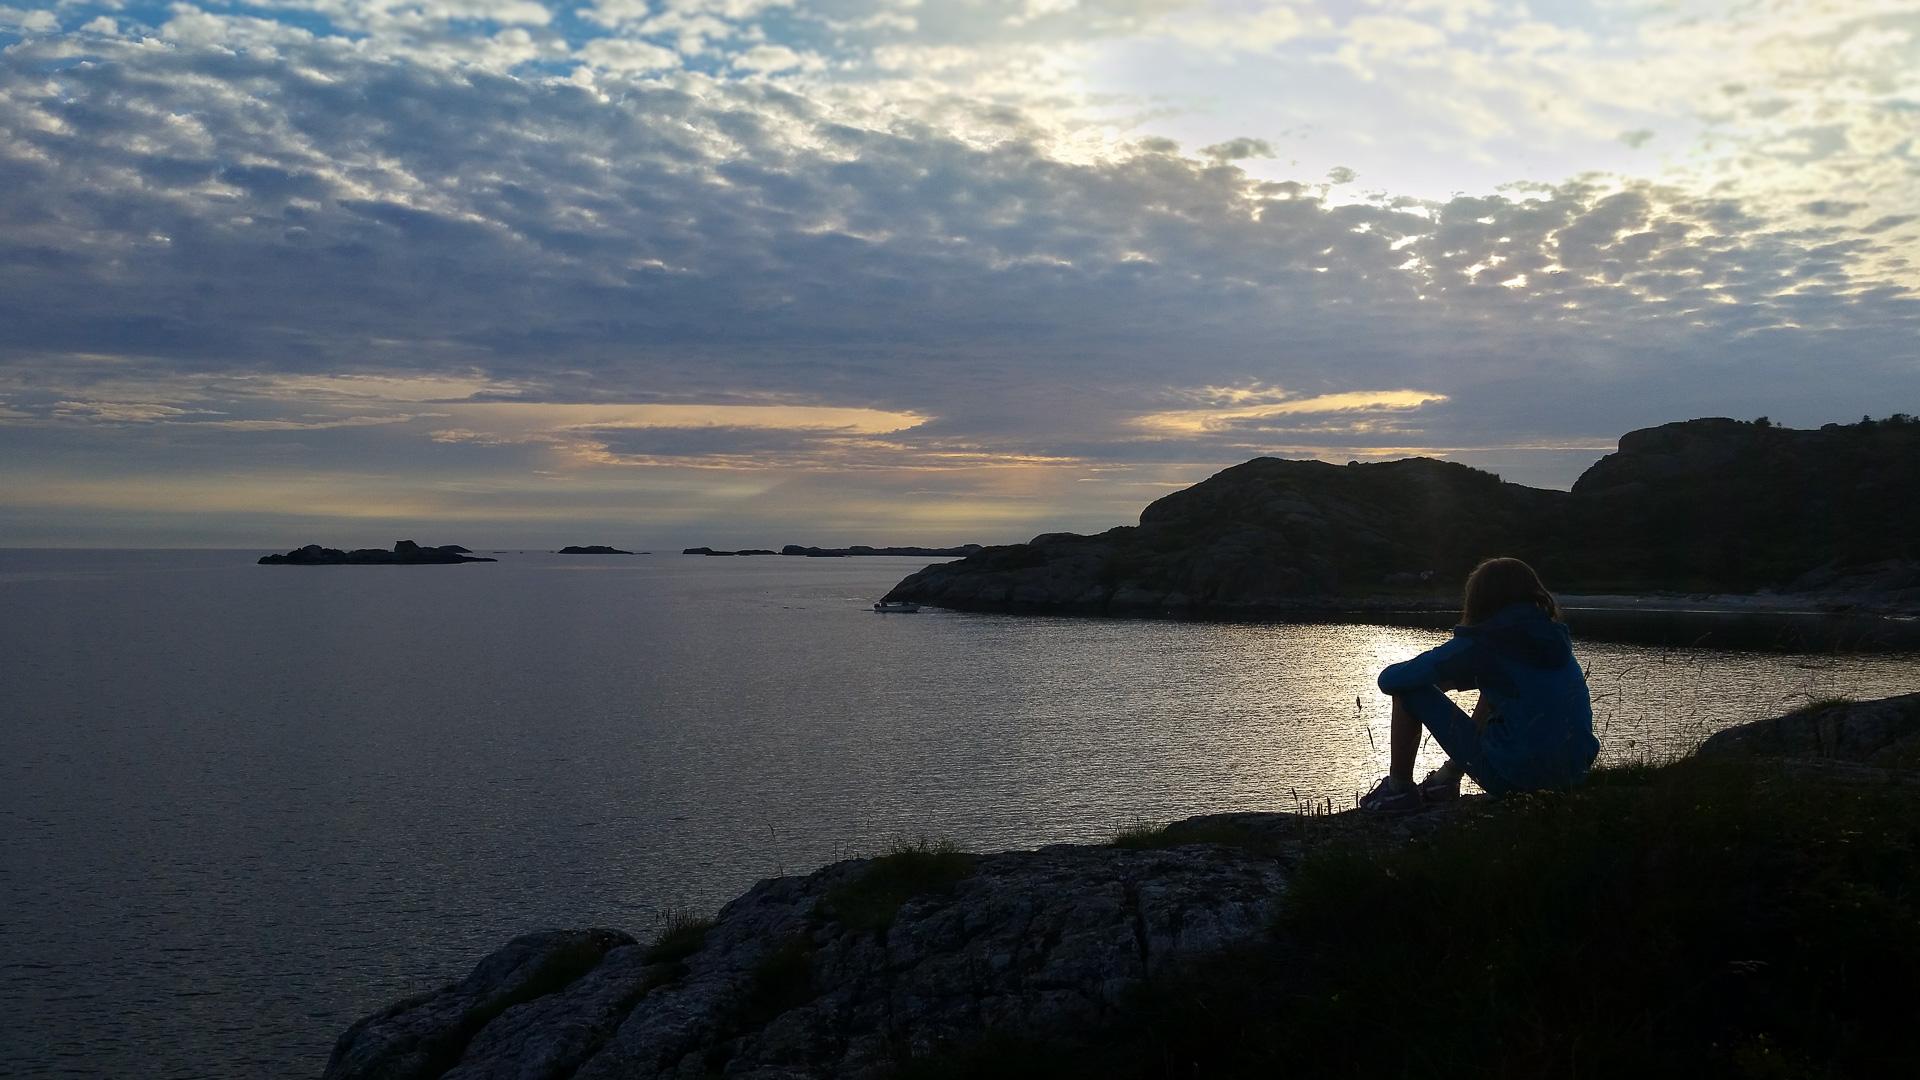 20160724_202636 Kamper - jaskinia art Lato 2016 Norwegia